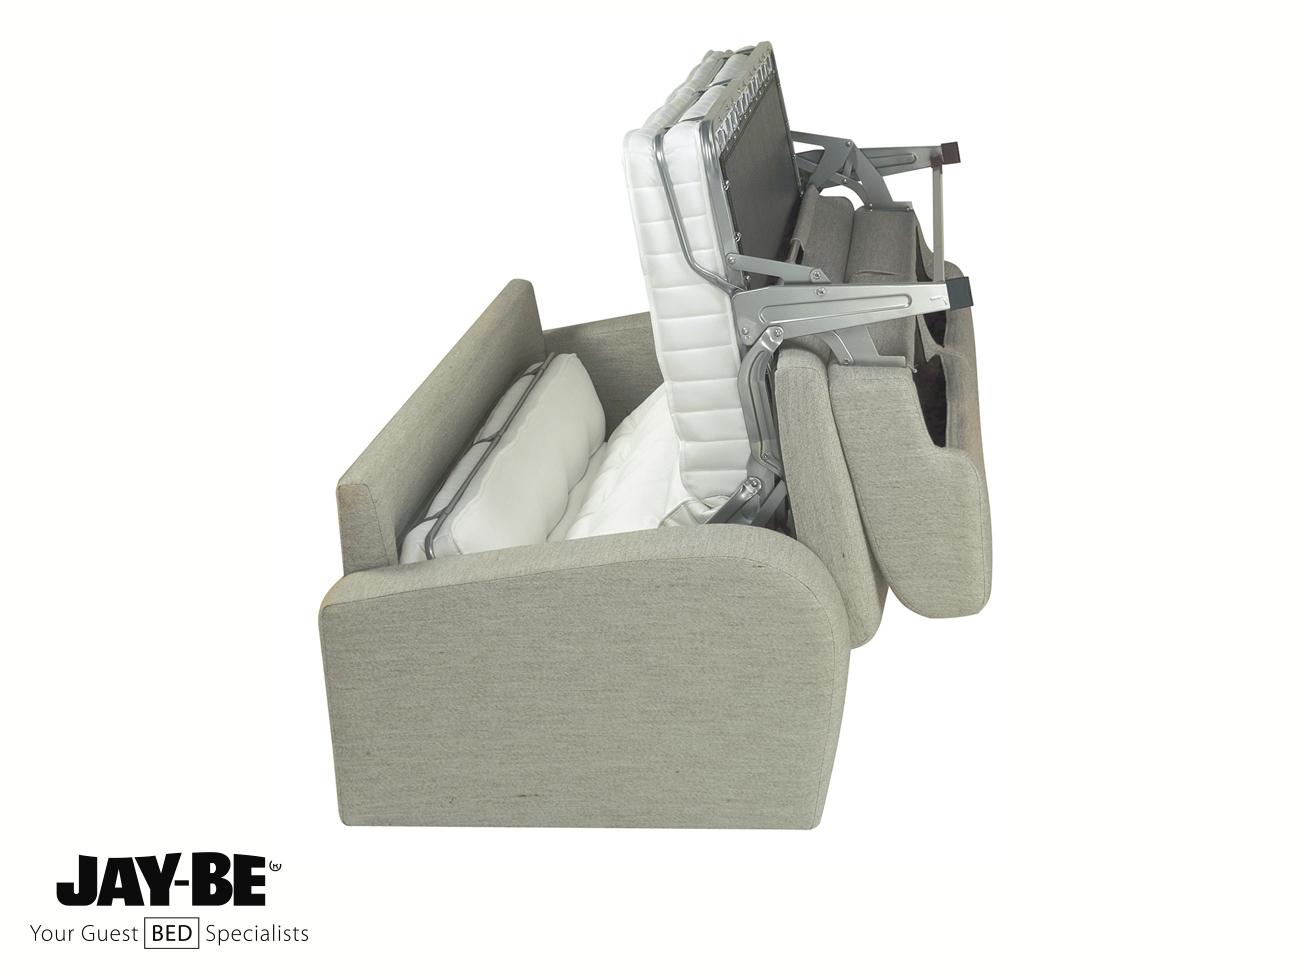 Peachy Jay Be Retailer Belfast N Ireland Jaybe Guest Beds Dublin Alphanode Cool Chair Designs And Ideas Alphanodeonline